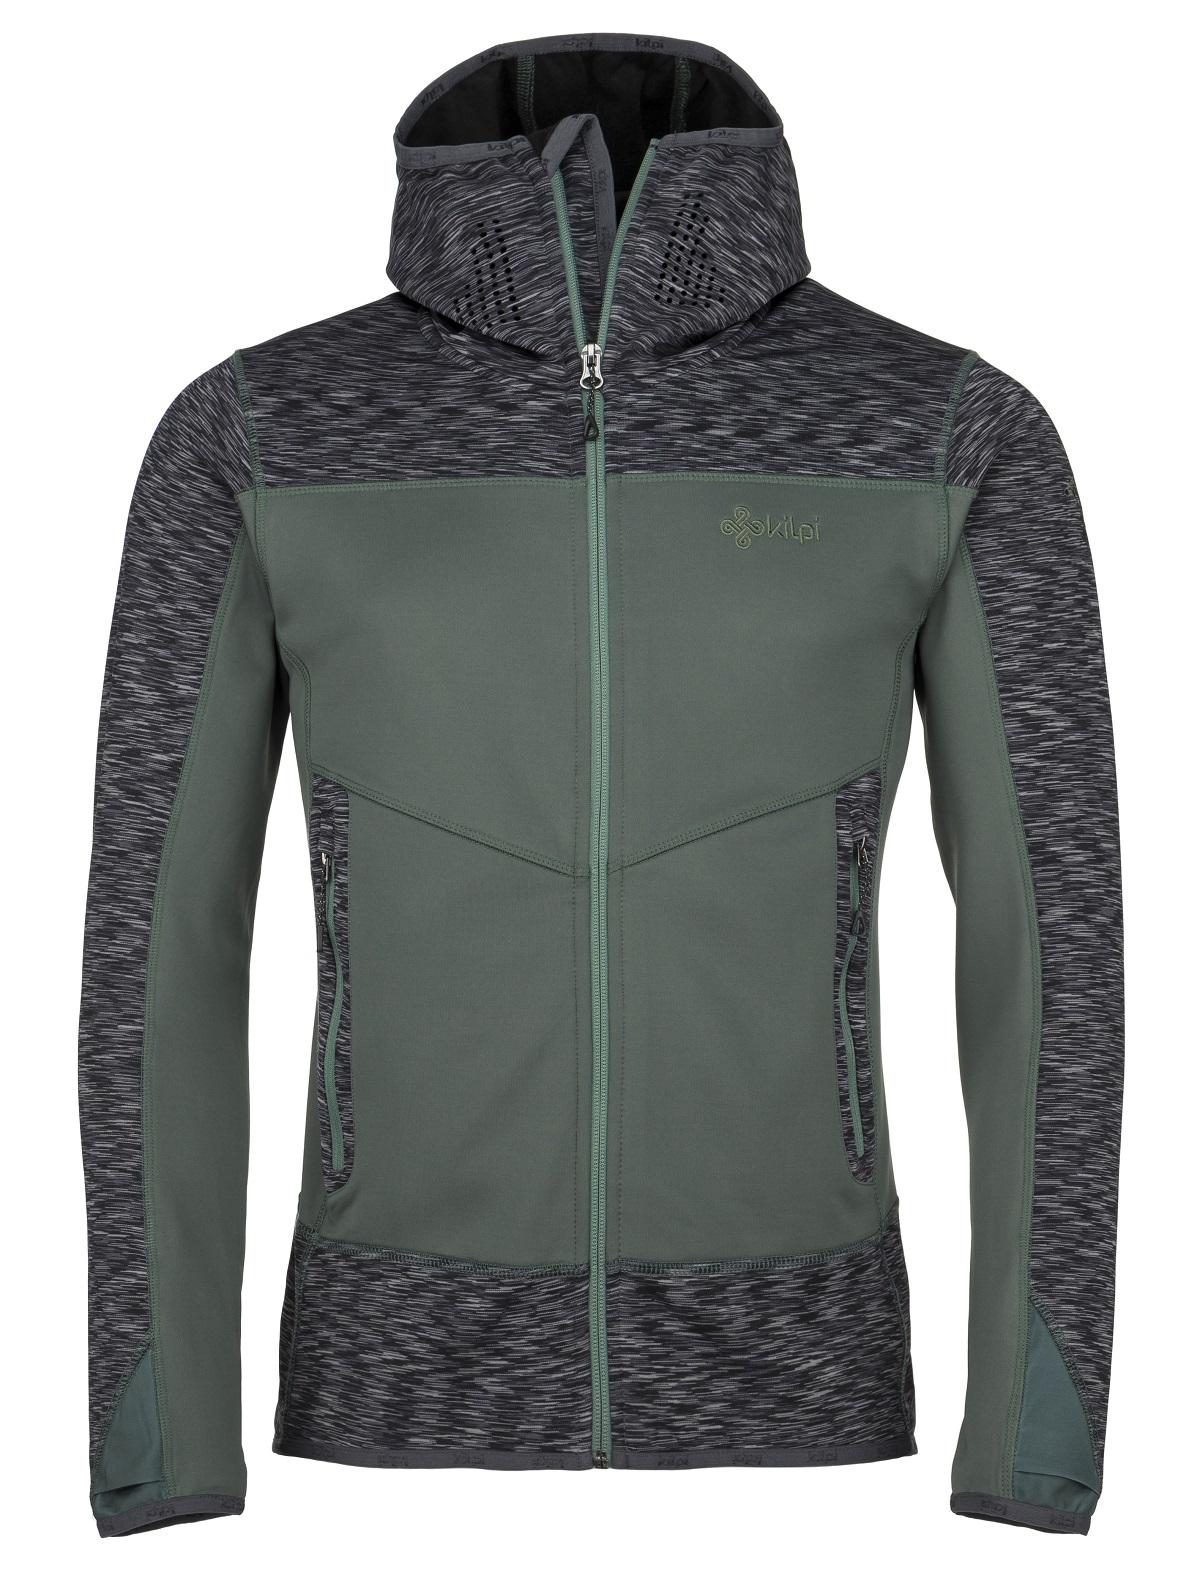 Men's technical fleece jacket Kilpi ASSASIN-M